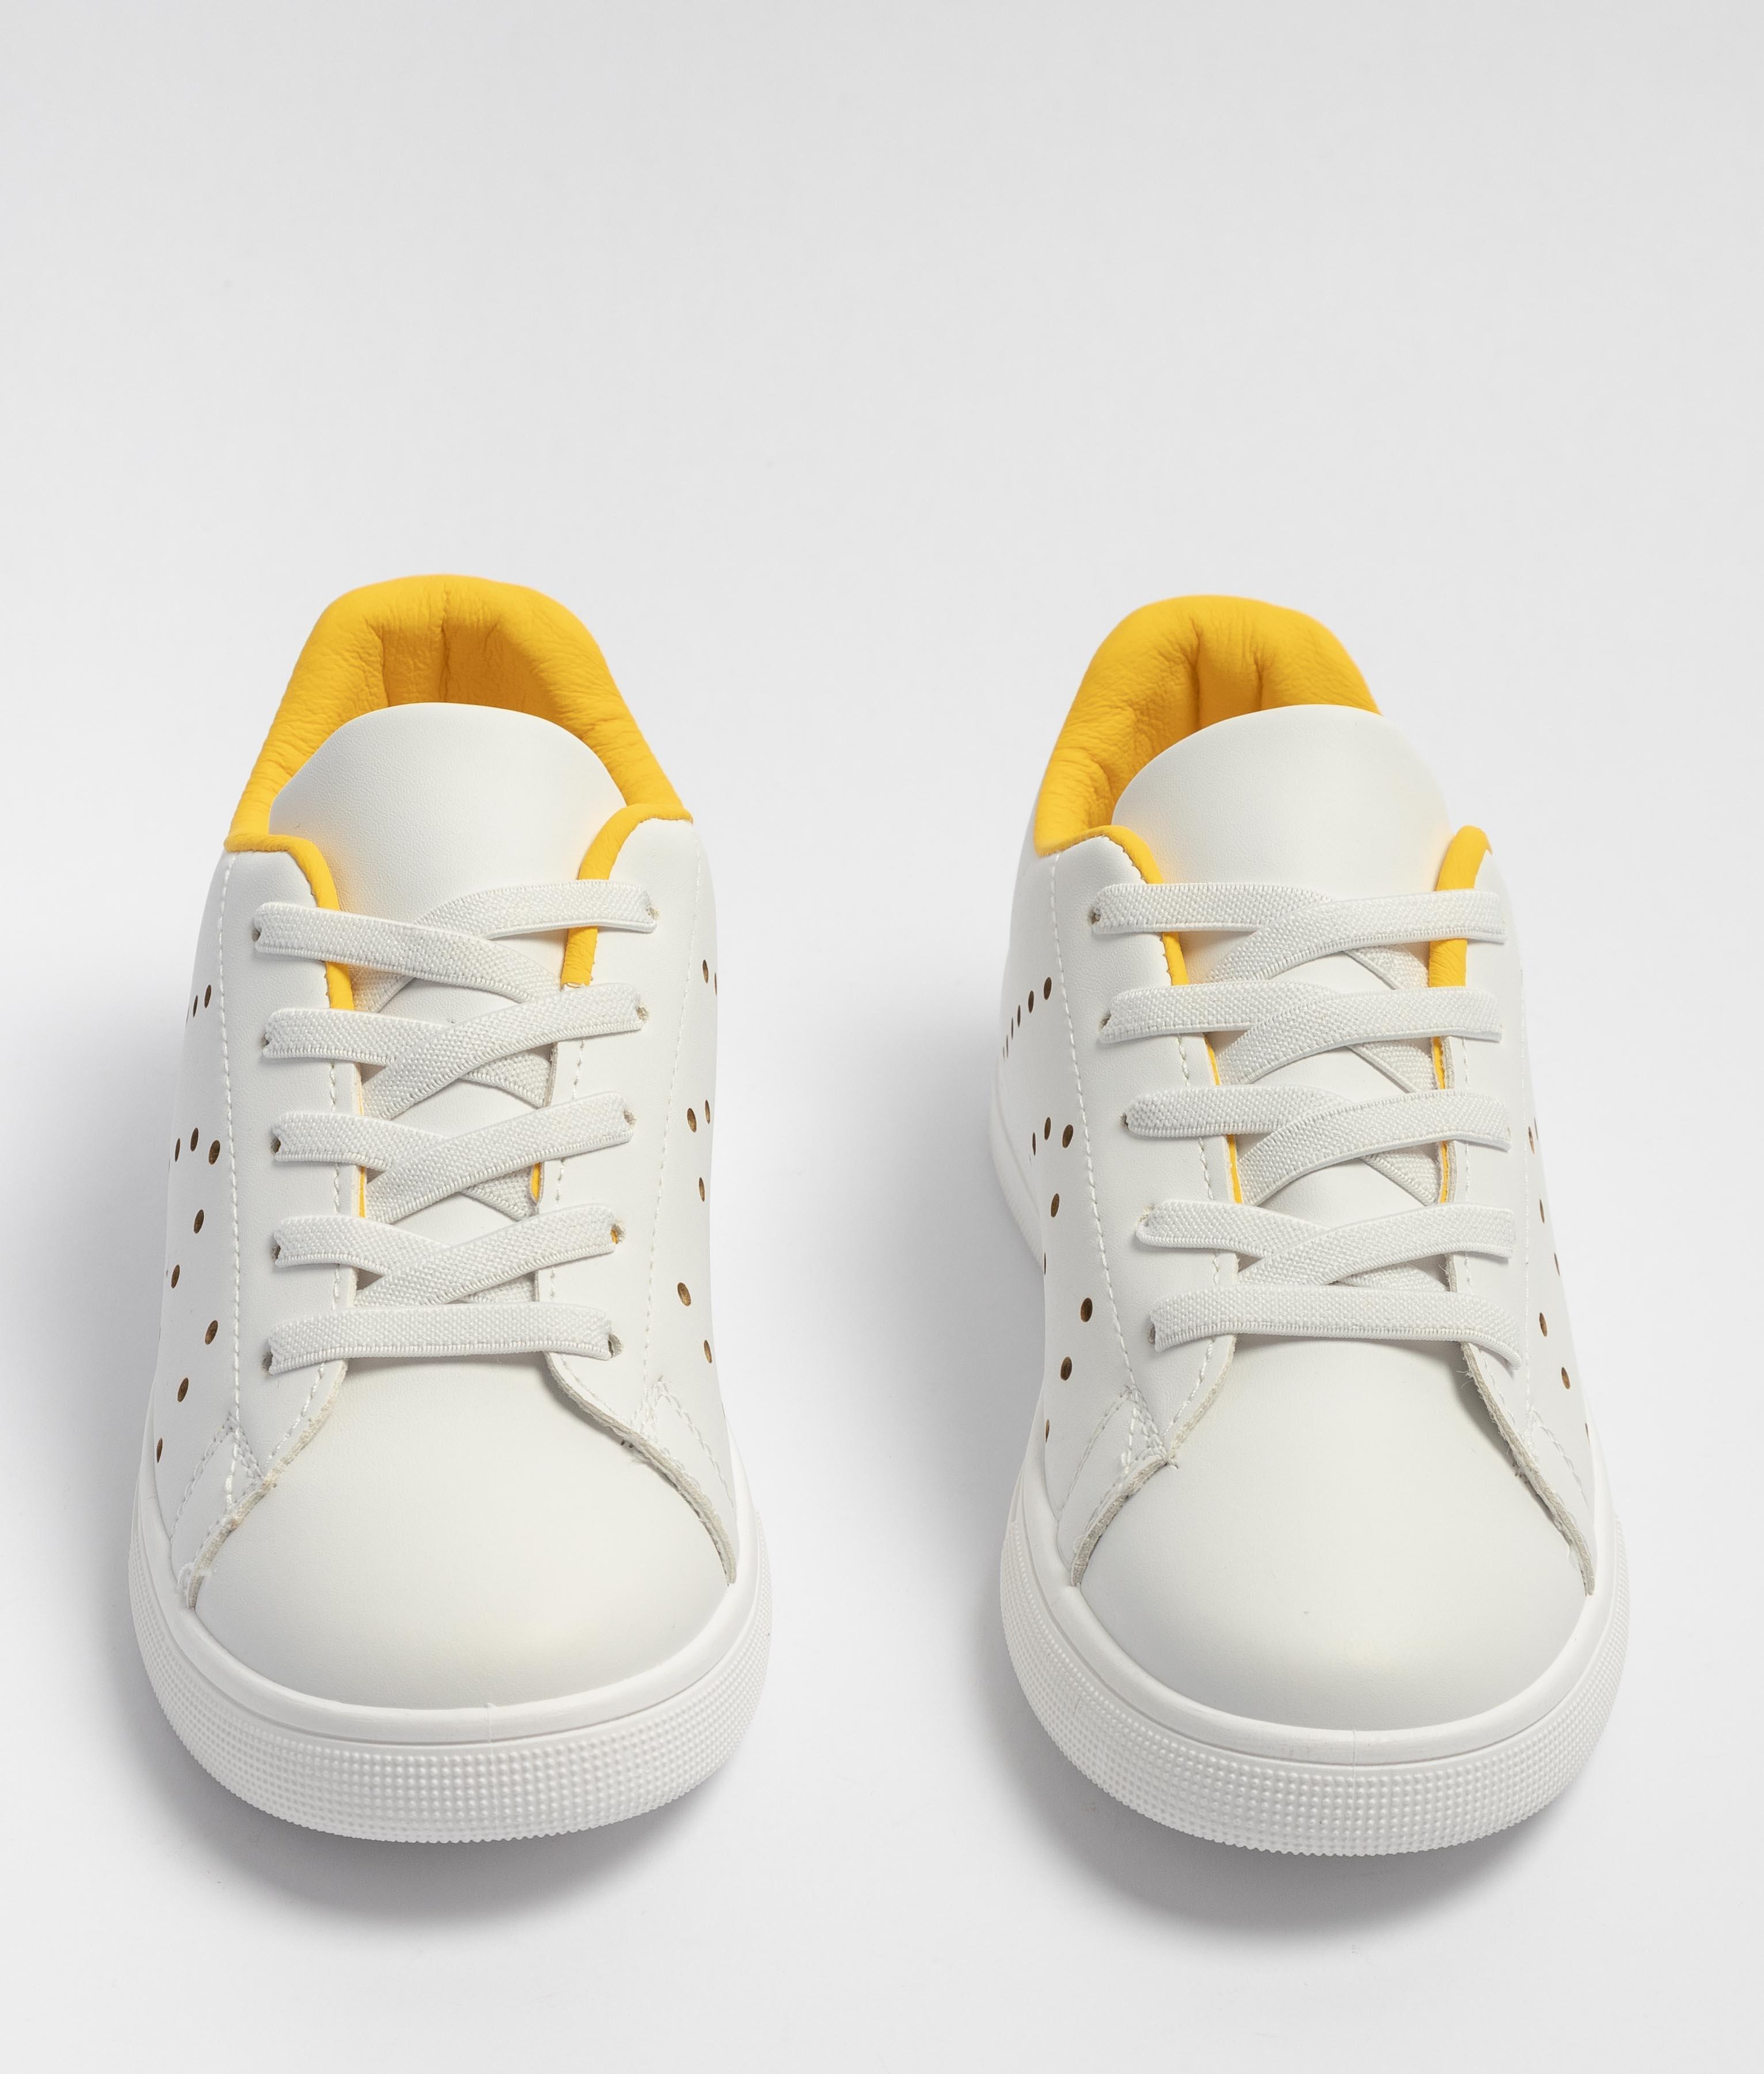 Sneakers Atelier - Amarillo